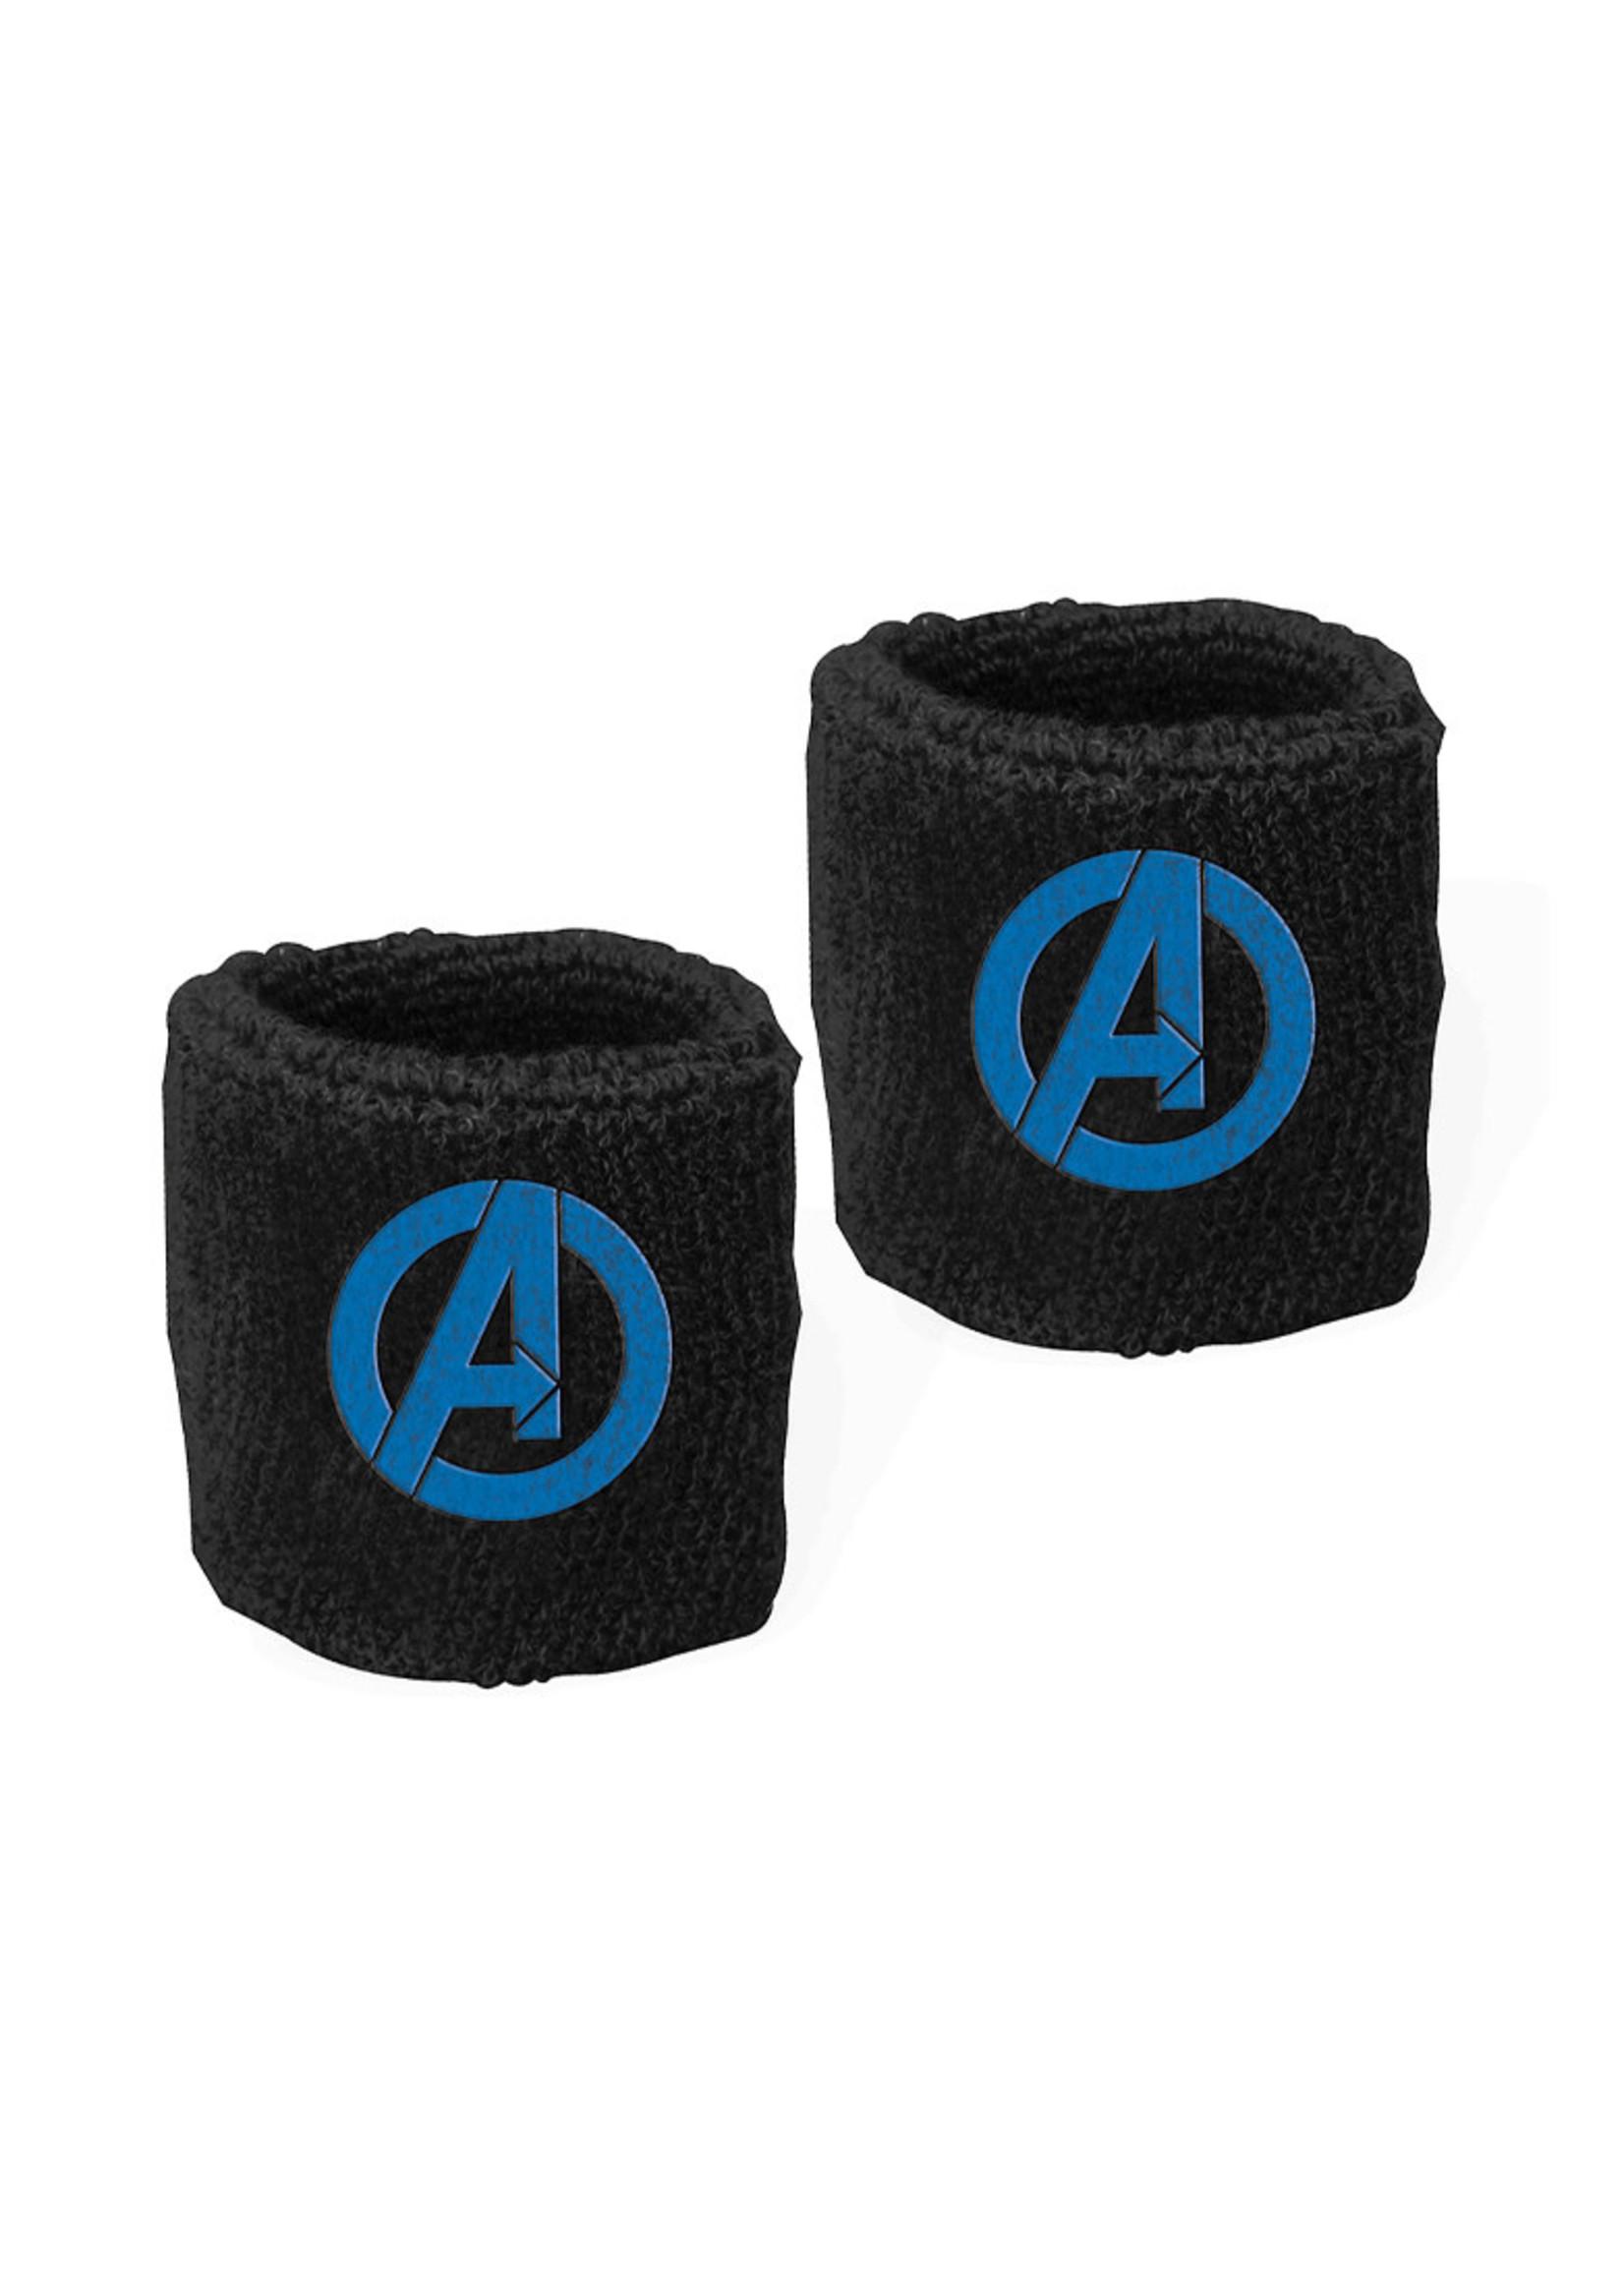 Marvel Powers Unite Sweat Bands 8ct